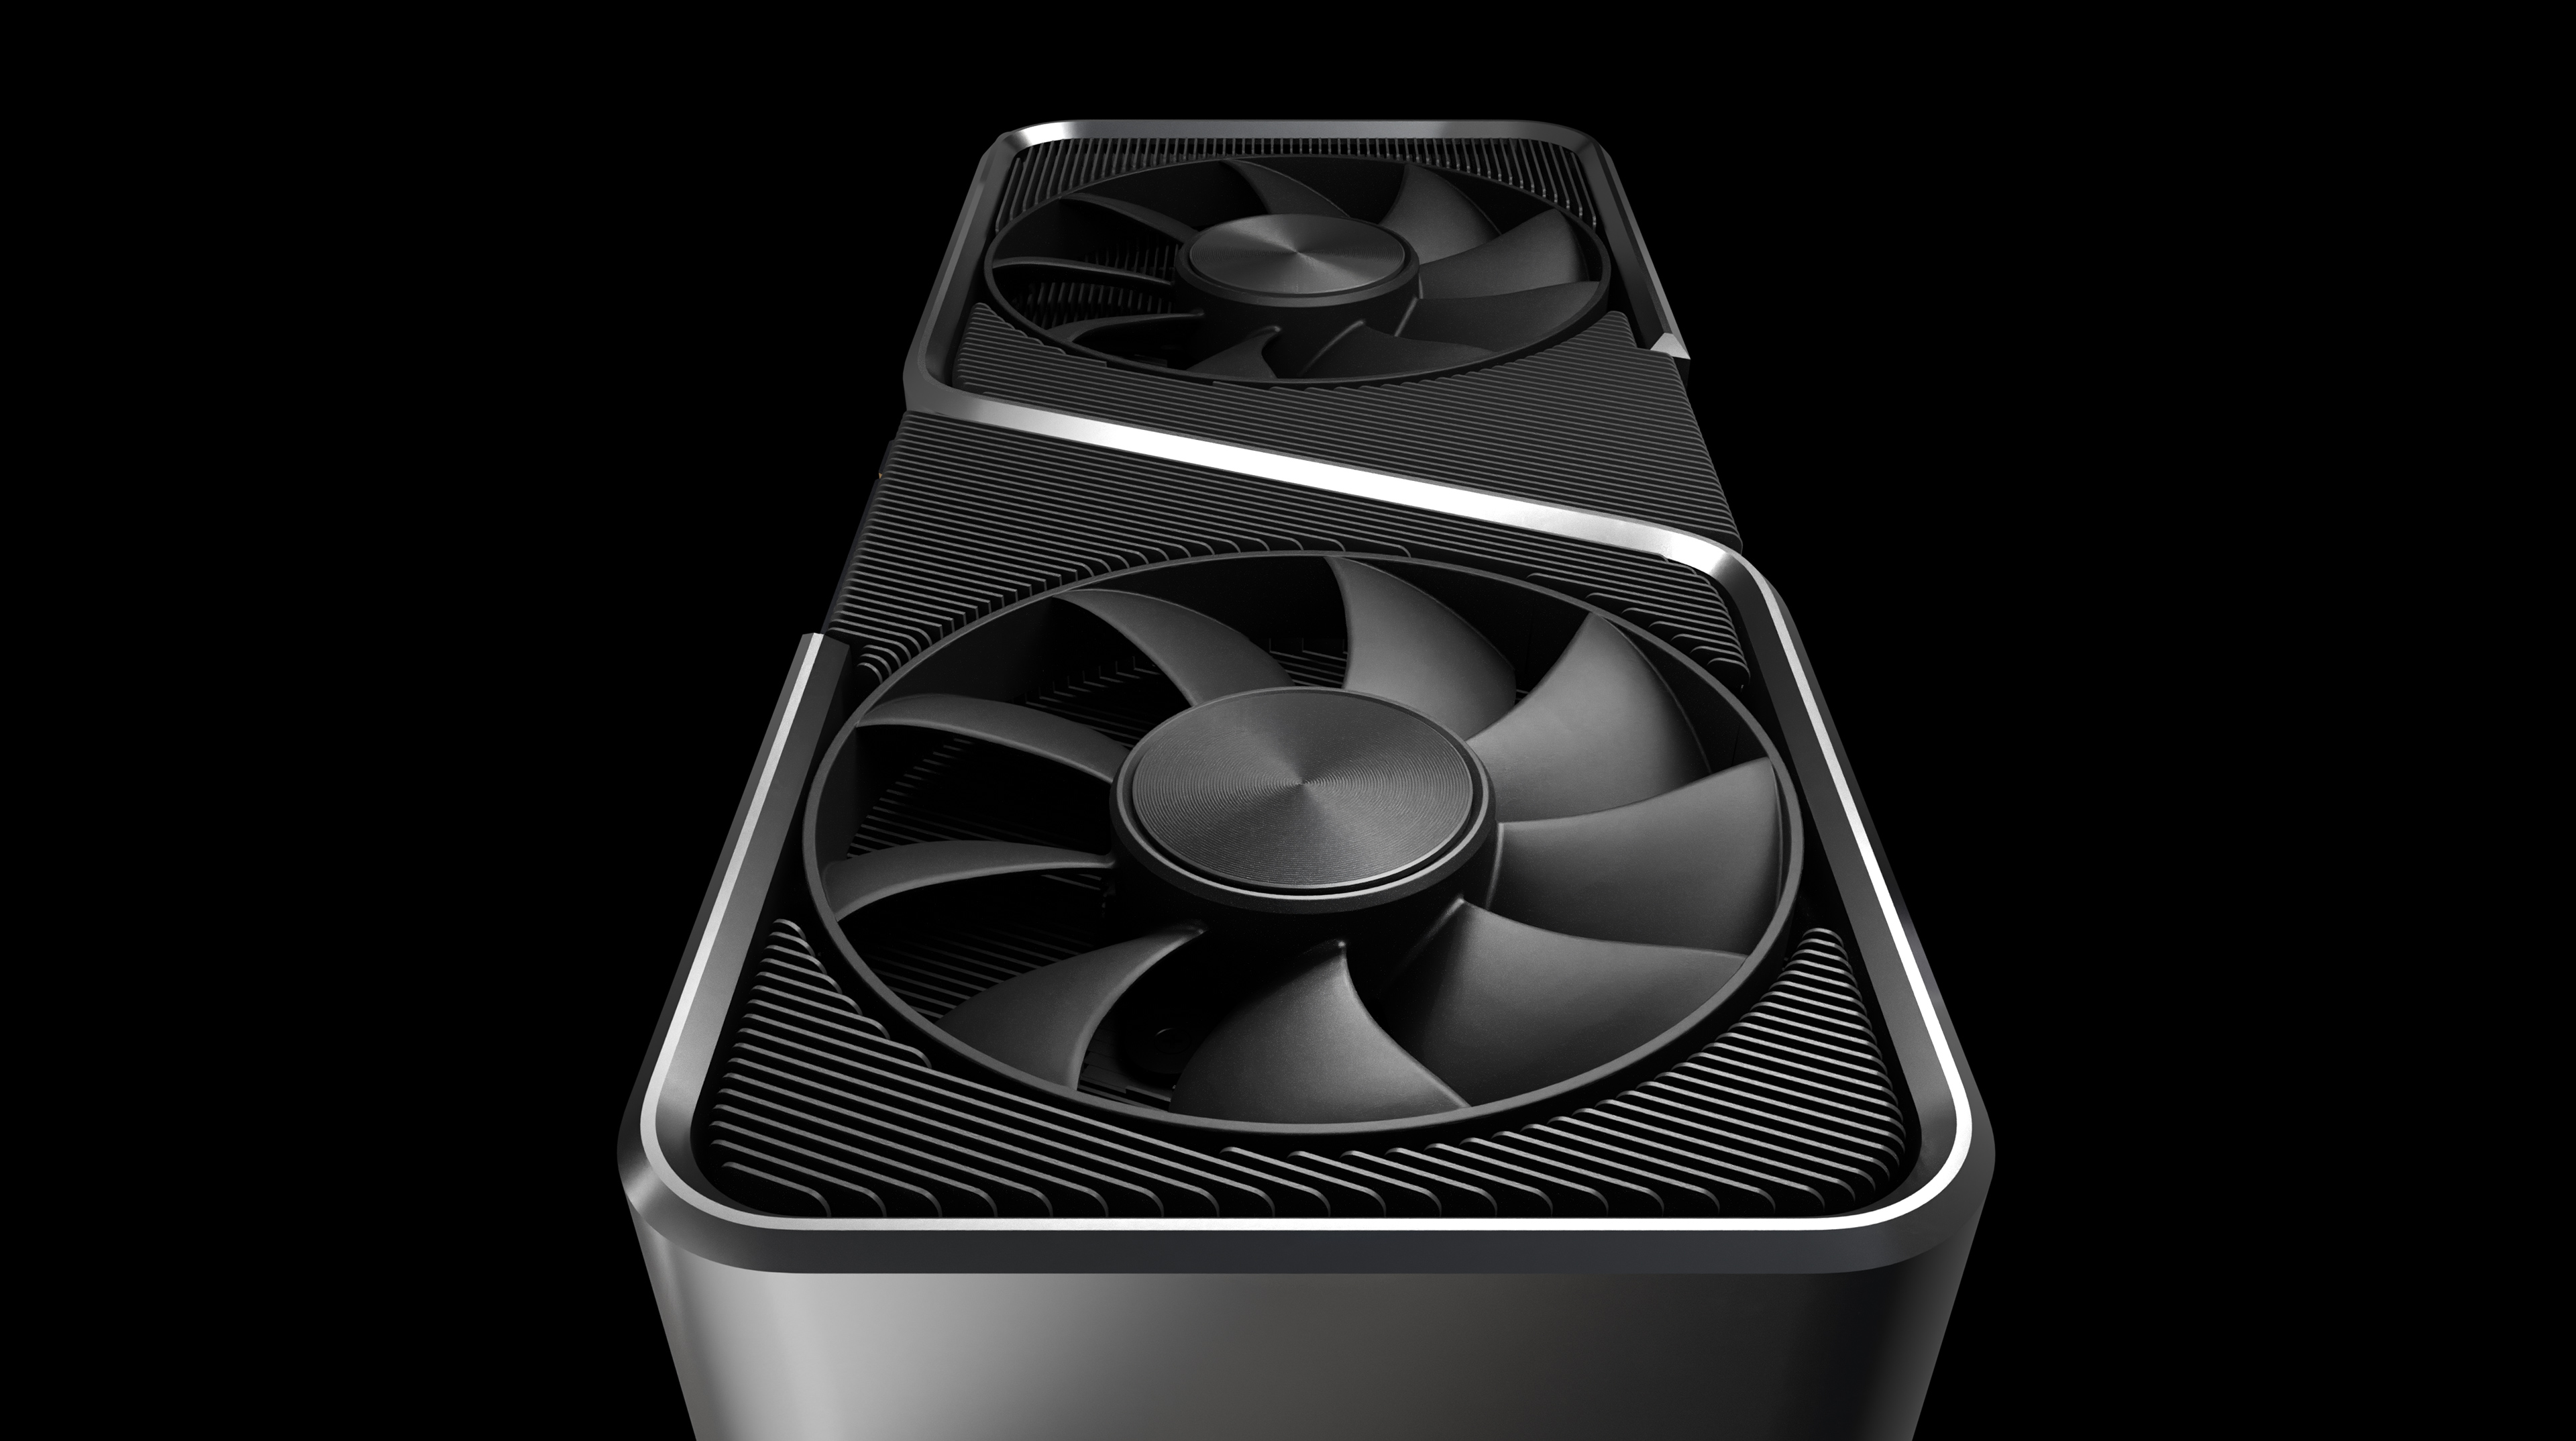 GeForce RTX 3070 image